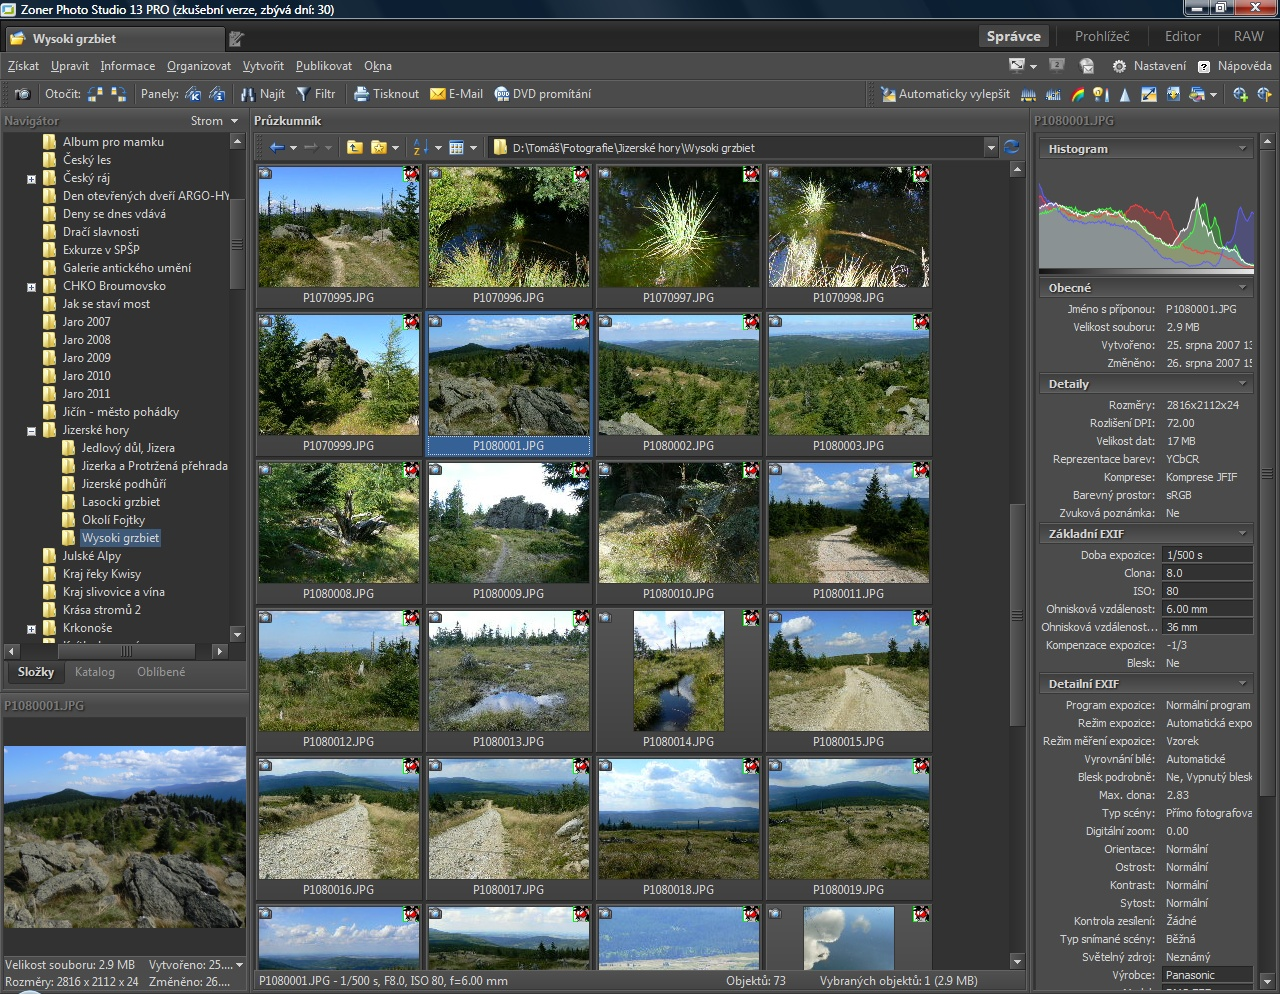 Zoner photo studio slideshow Download ACDS ee Photo Studio Ultimate 2018 11.2